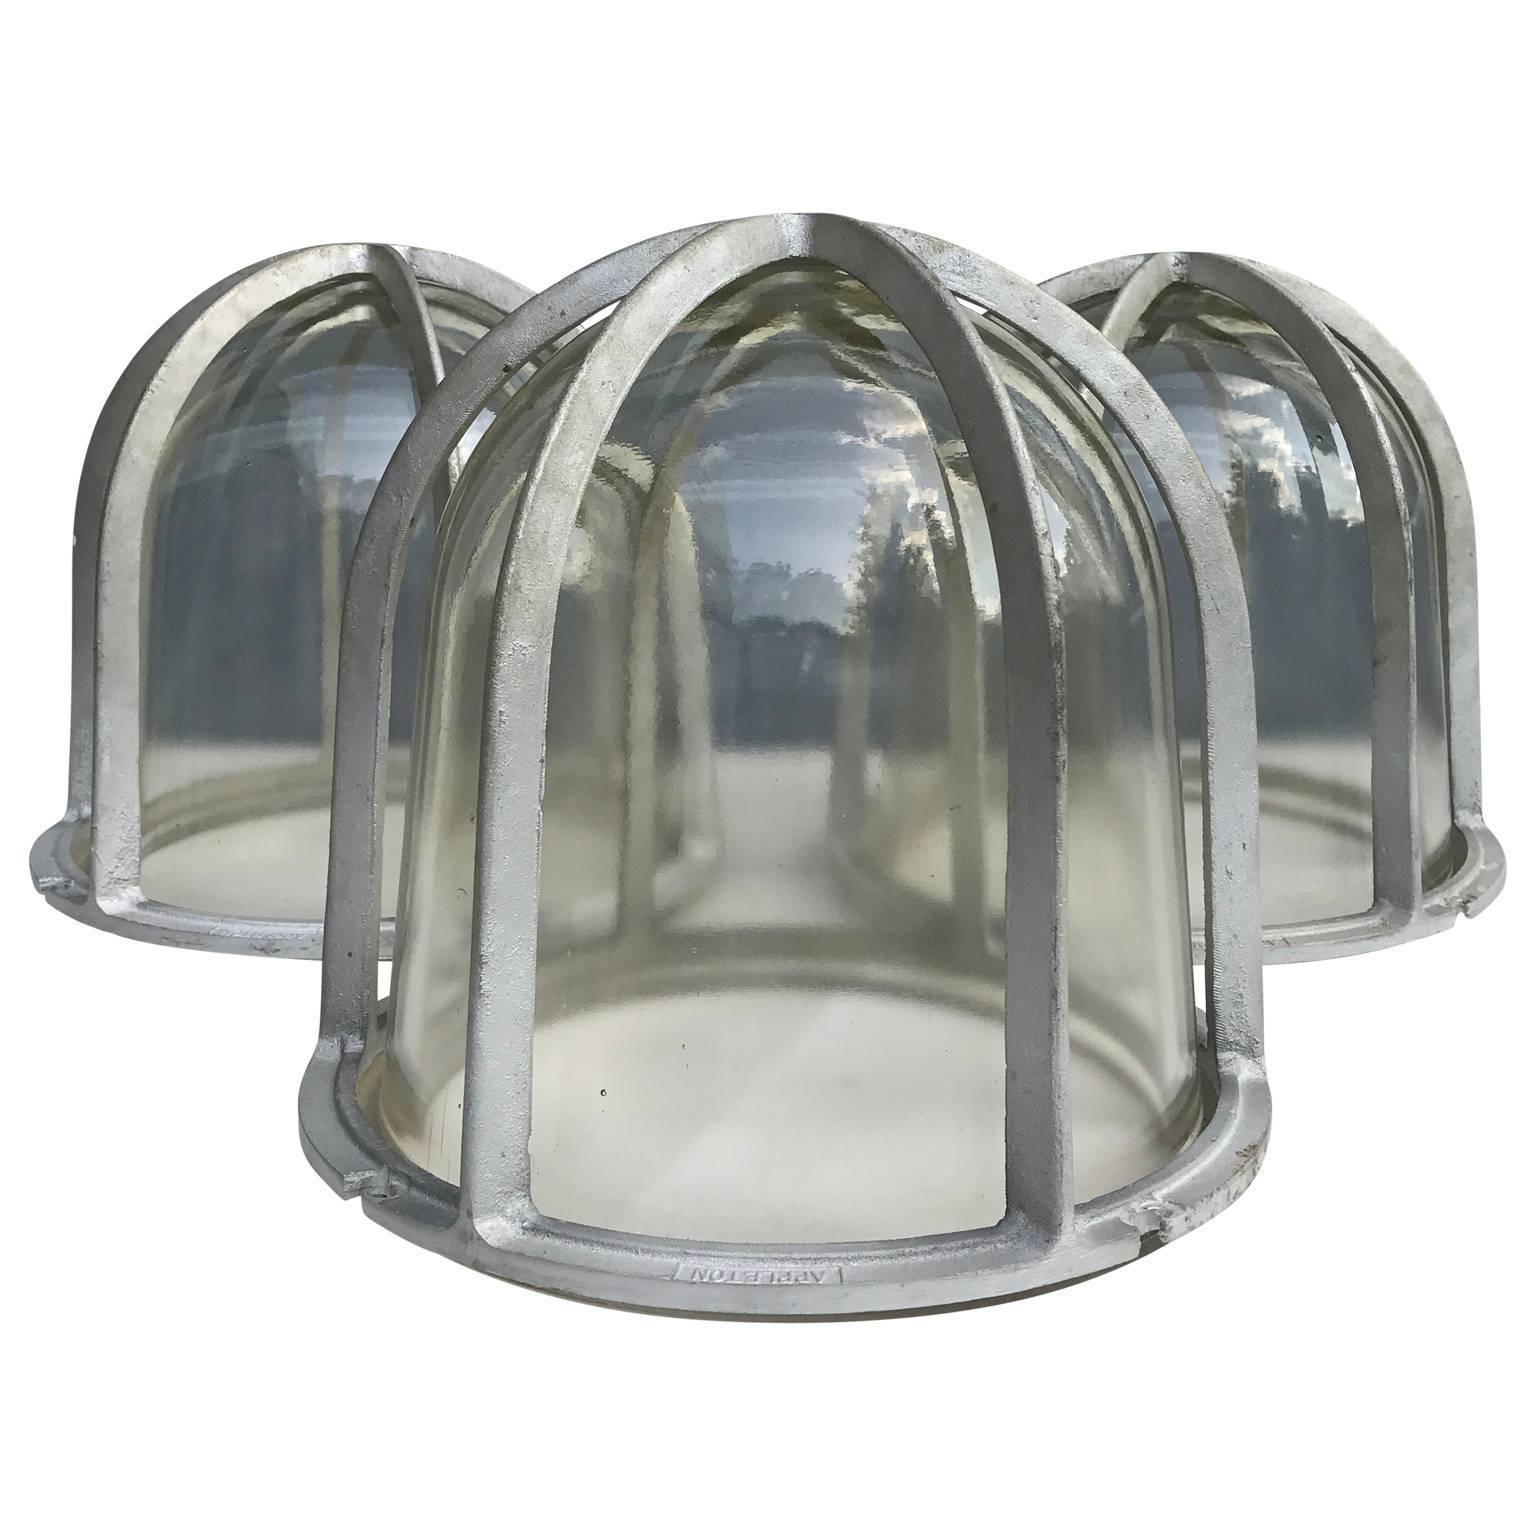 Set of Three Large Industrial Appleton Blast-Resistant Ceiling Lamps